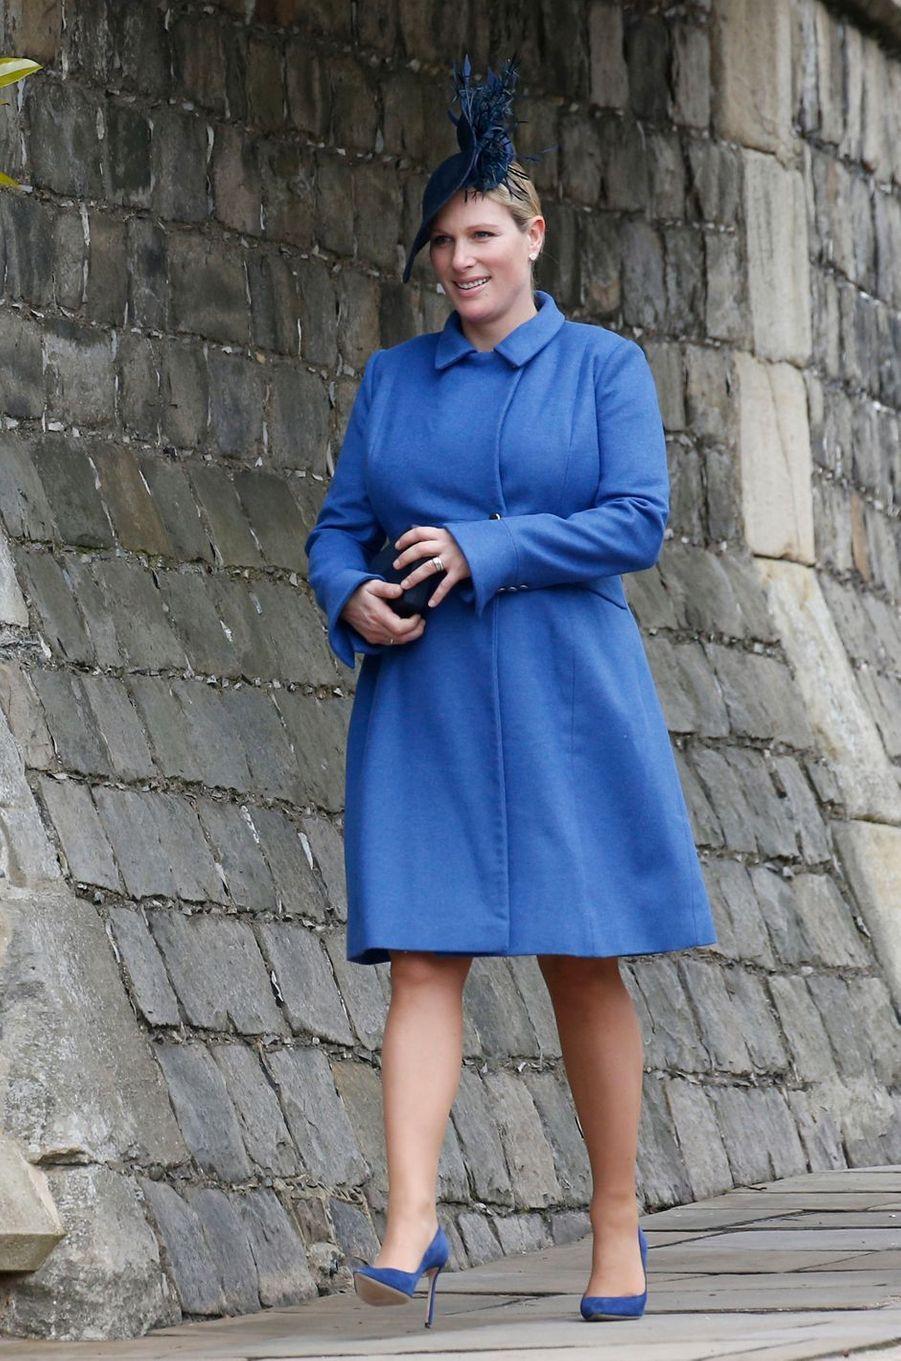 Zara Phillips, enceinte, en Séraphine, à Windsor le 1er avril 2018